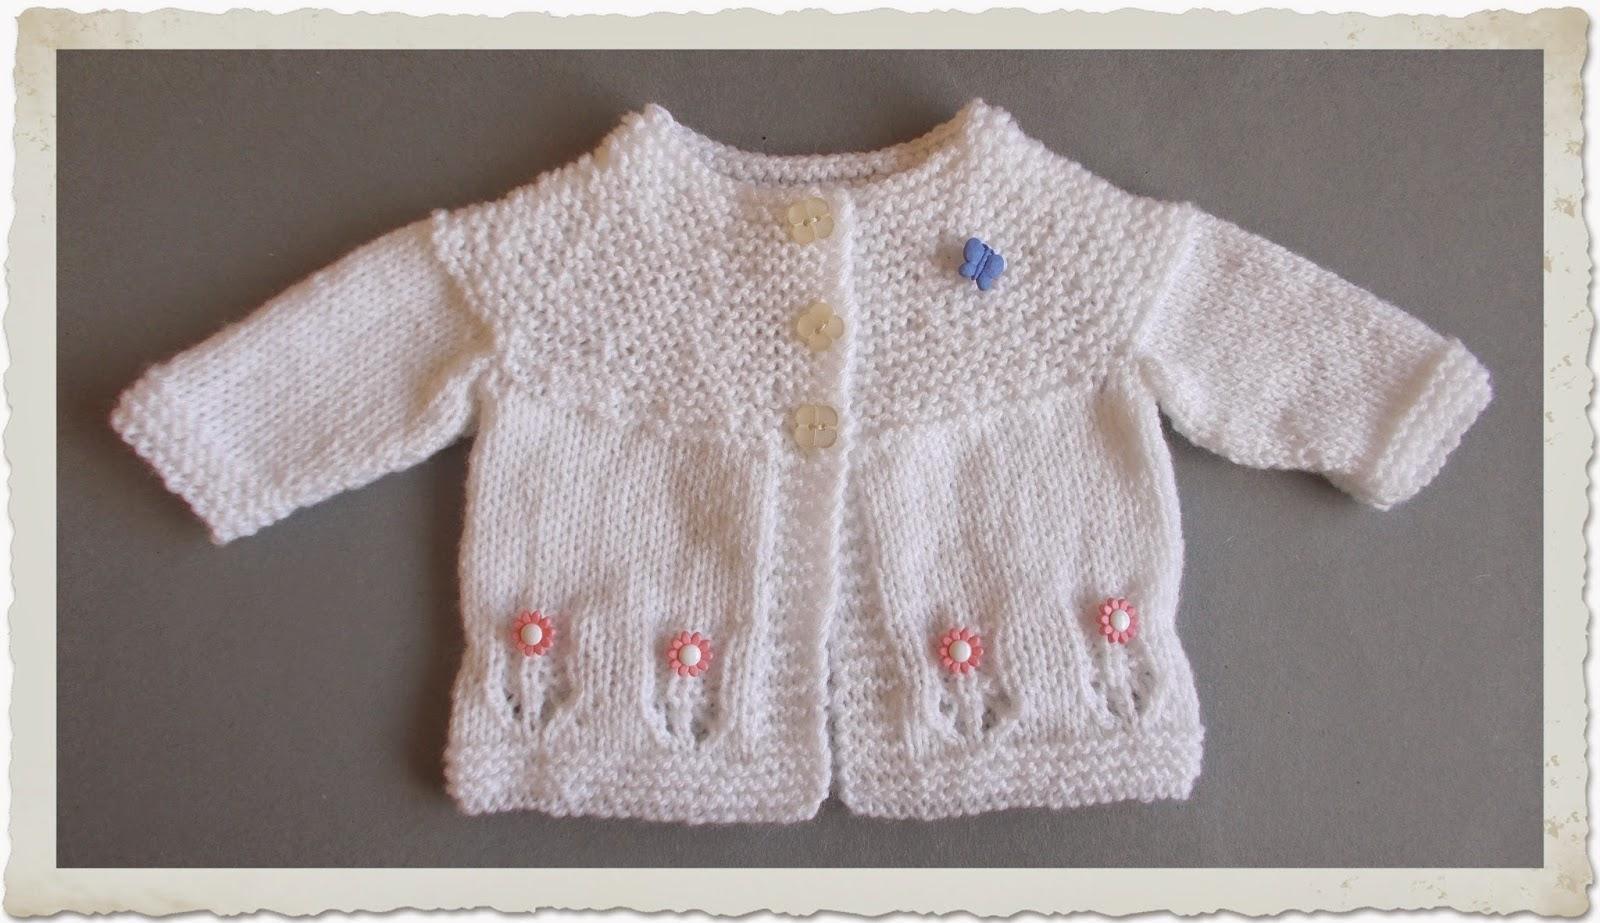 e5a80420fdbc made-by-marianna  My Free Knitting Patterns